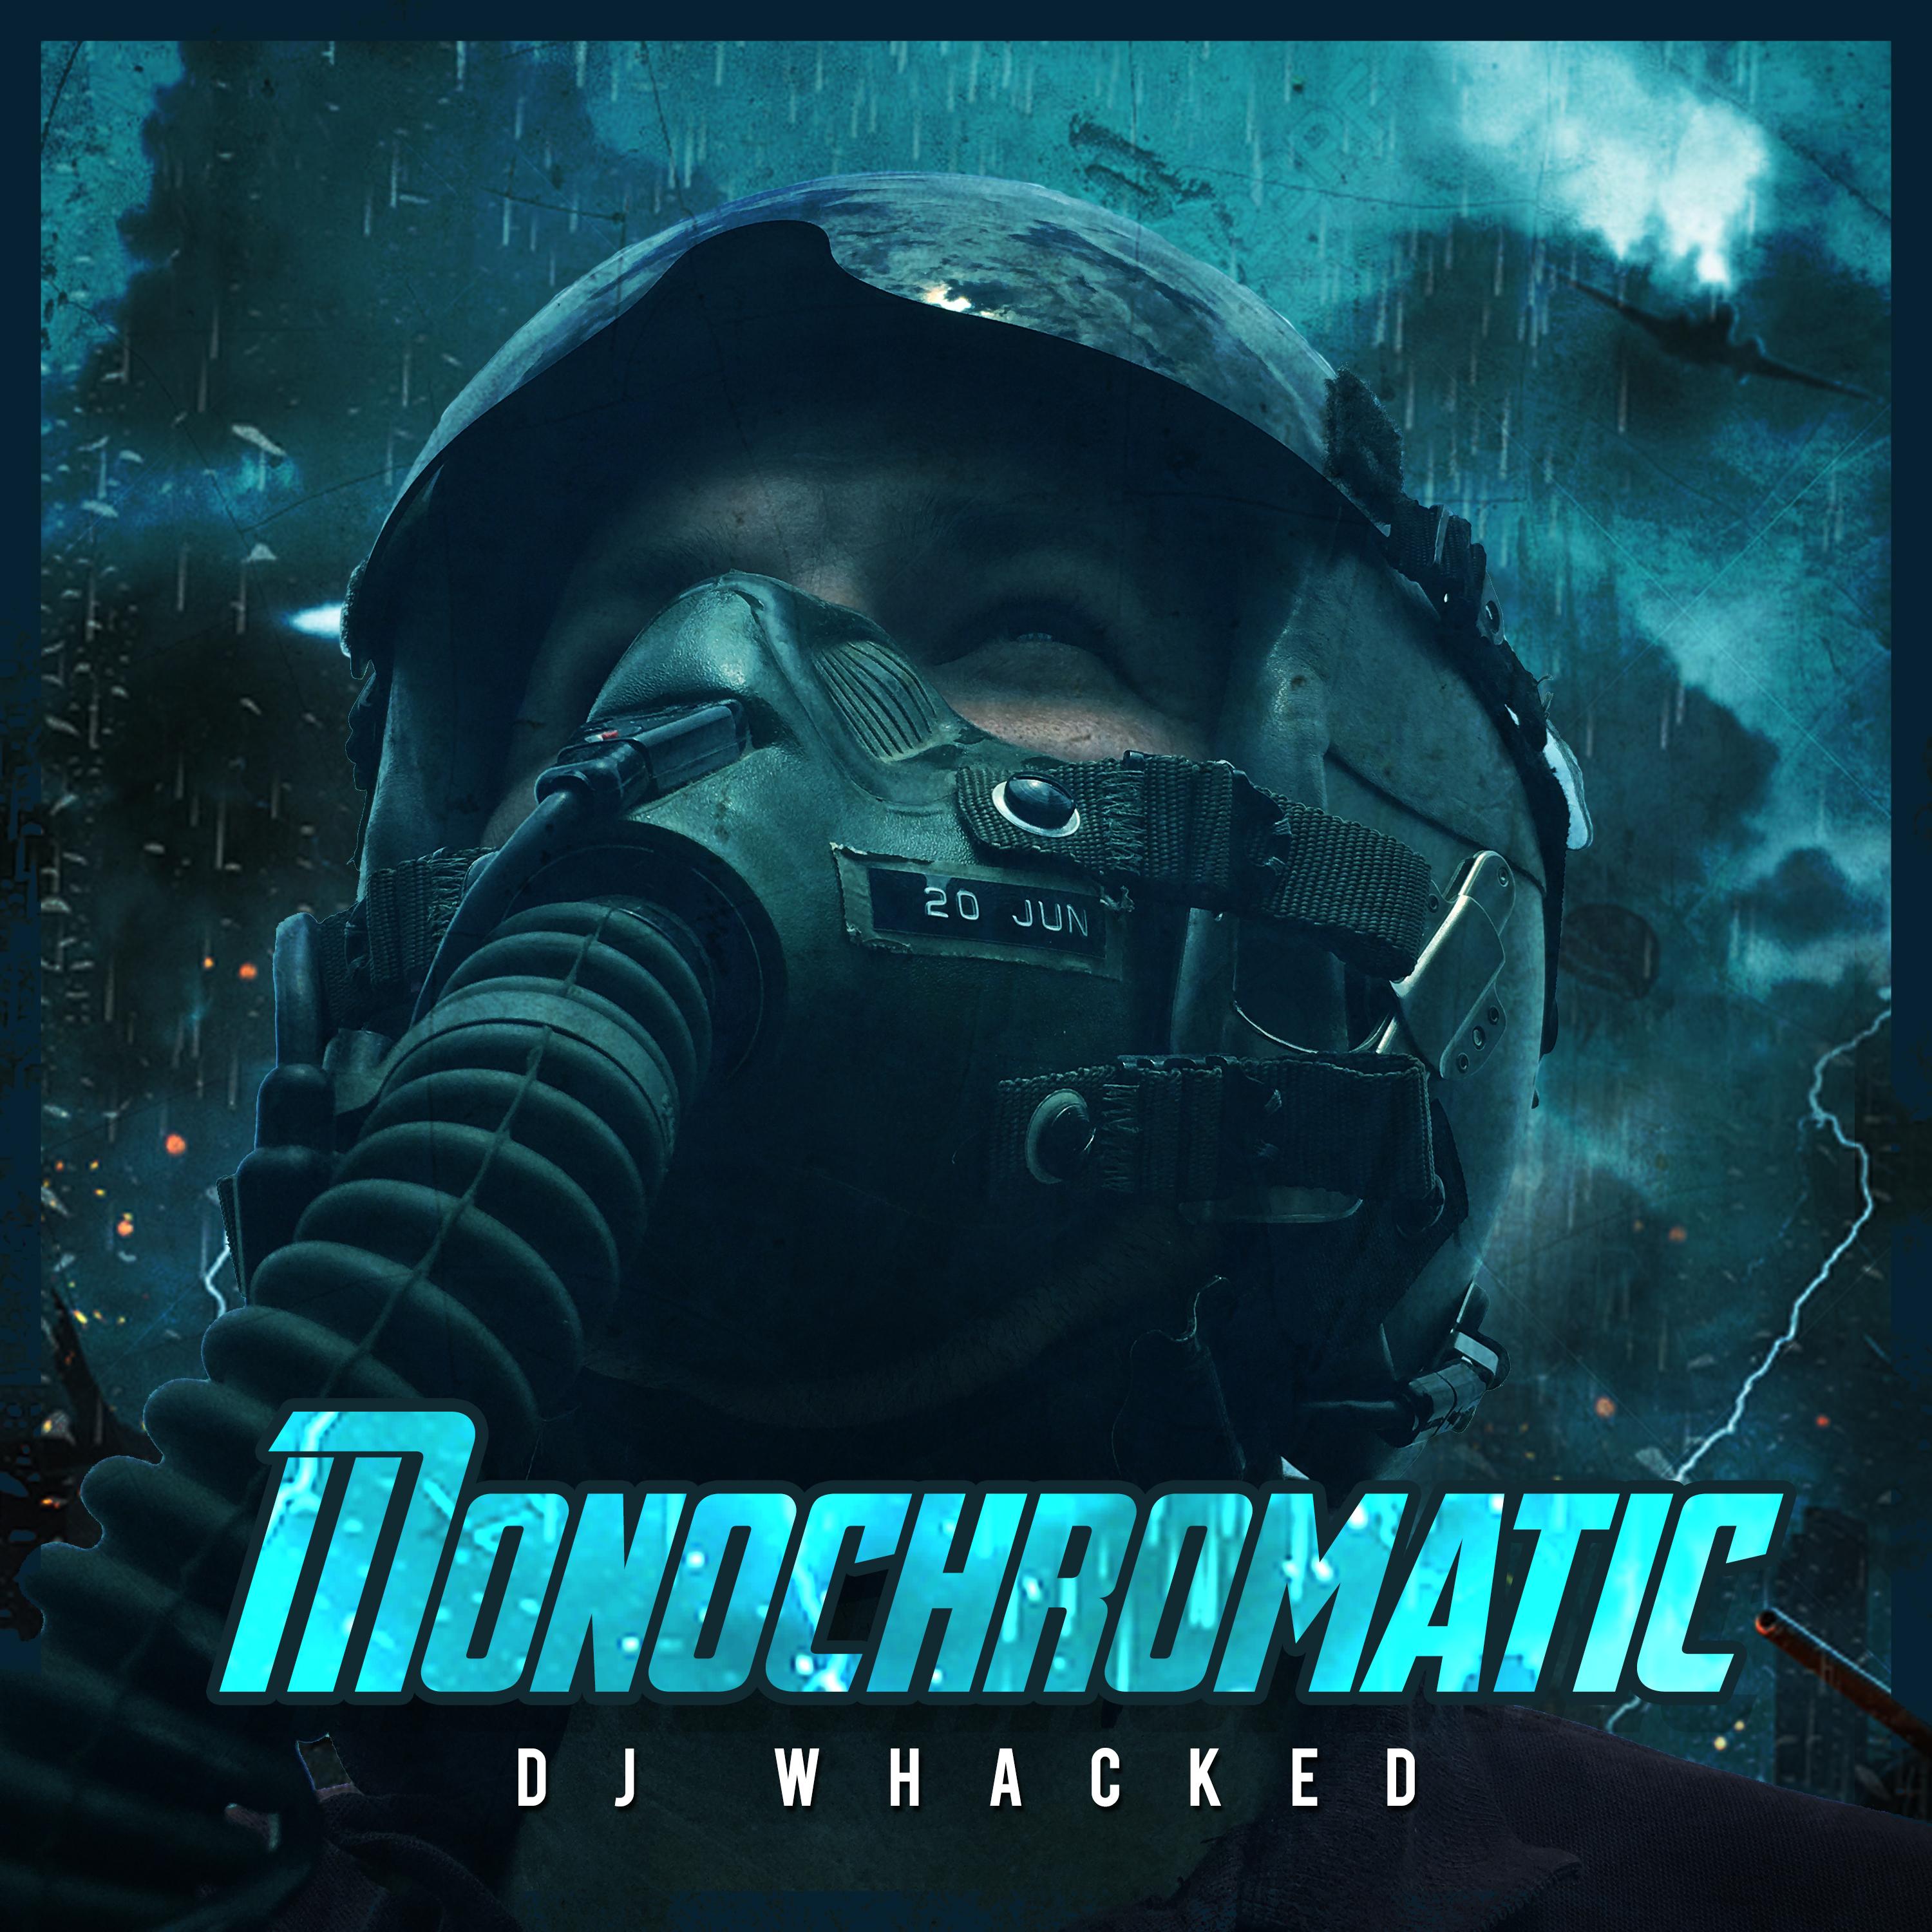 DJ Whacked Ready To Drop New Album 'Monochromatic'